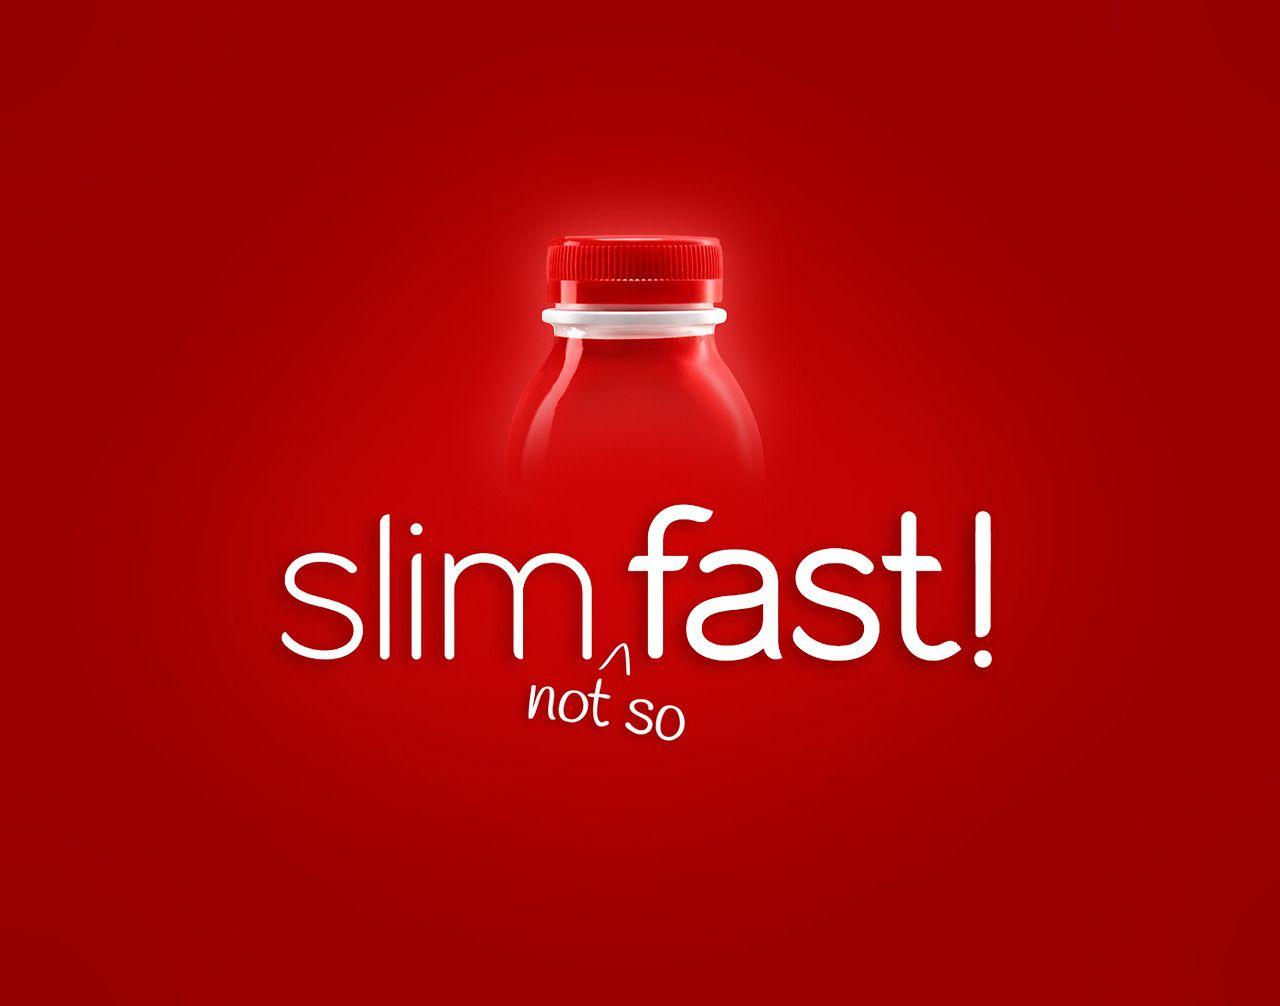 Honest Brand Slogan For Slim Fast With Images Advertising Slogans